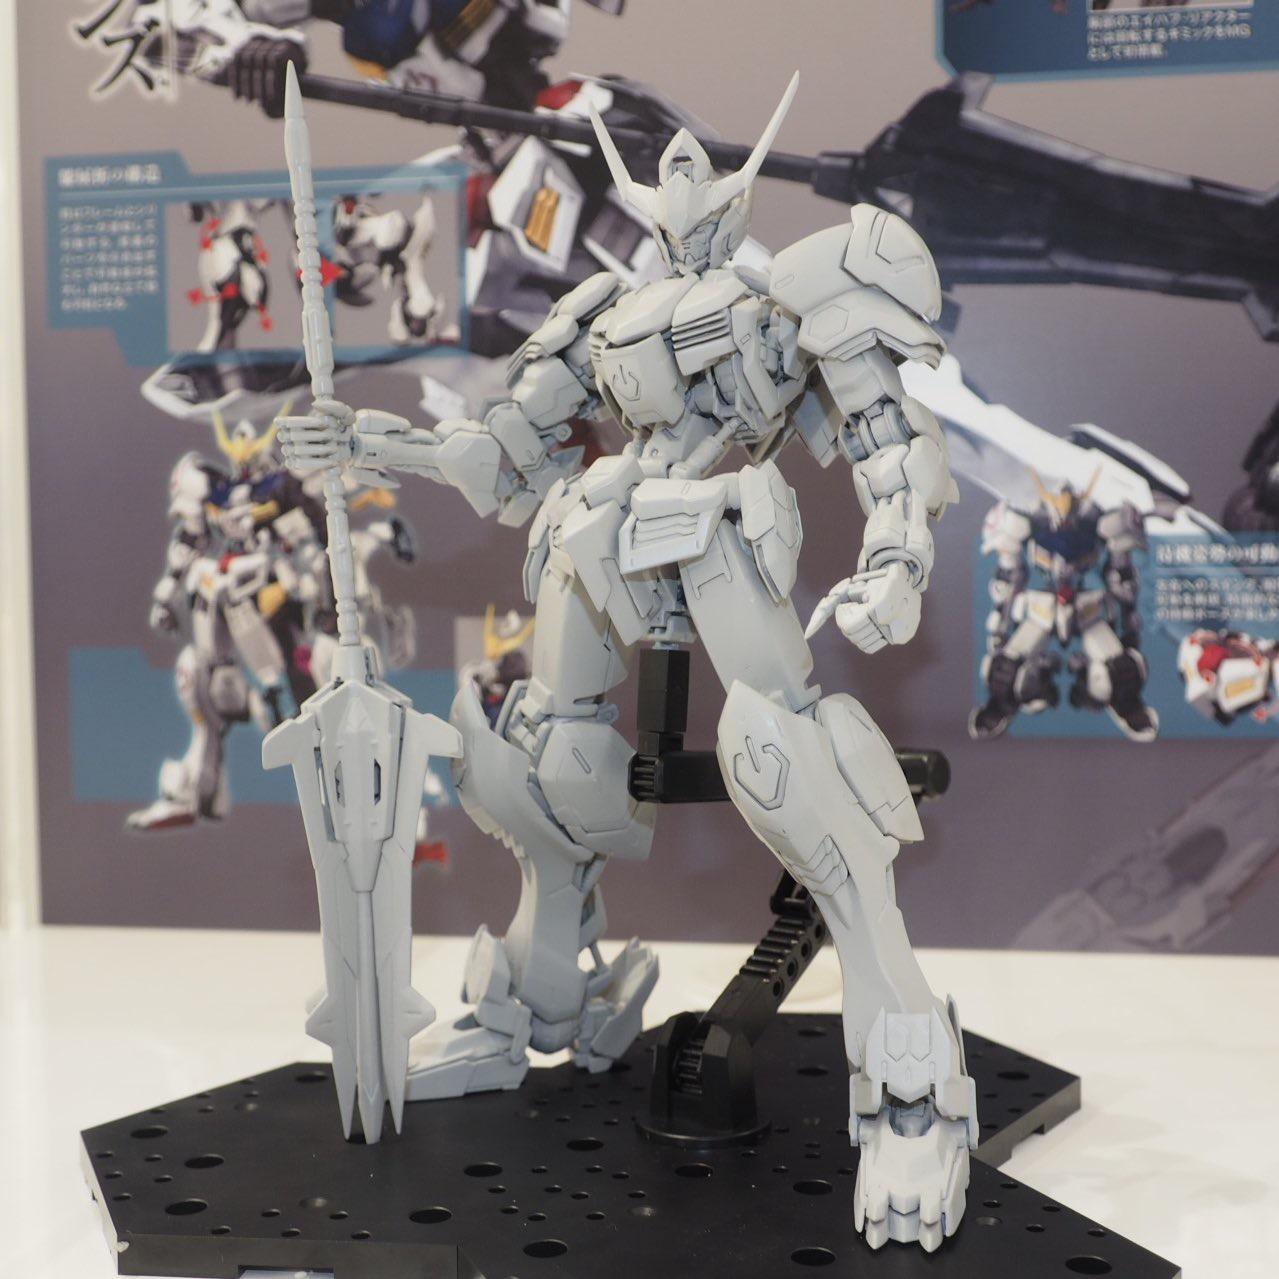 GUNJAP | Daily Gundam News since April 7th 2011